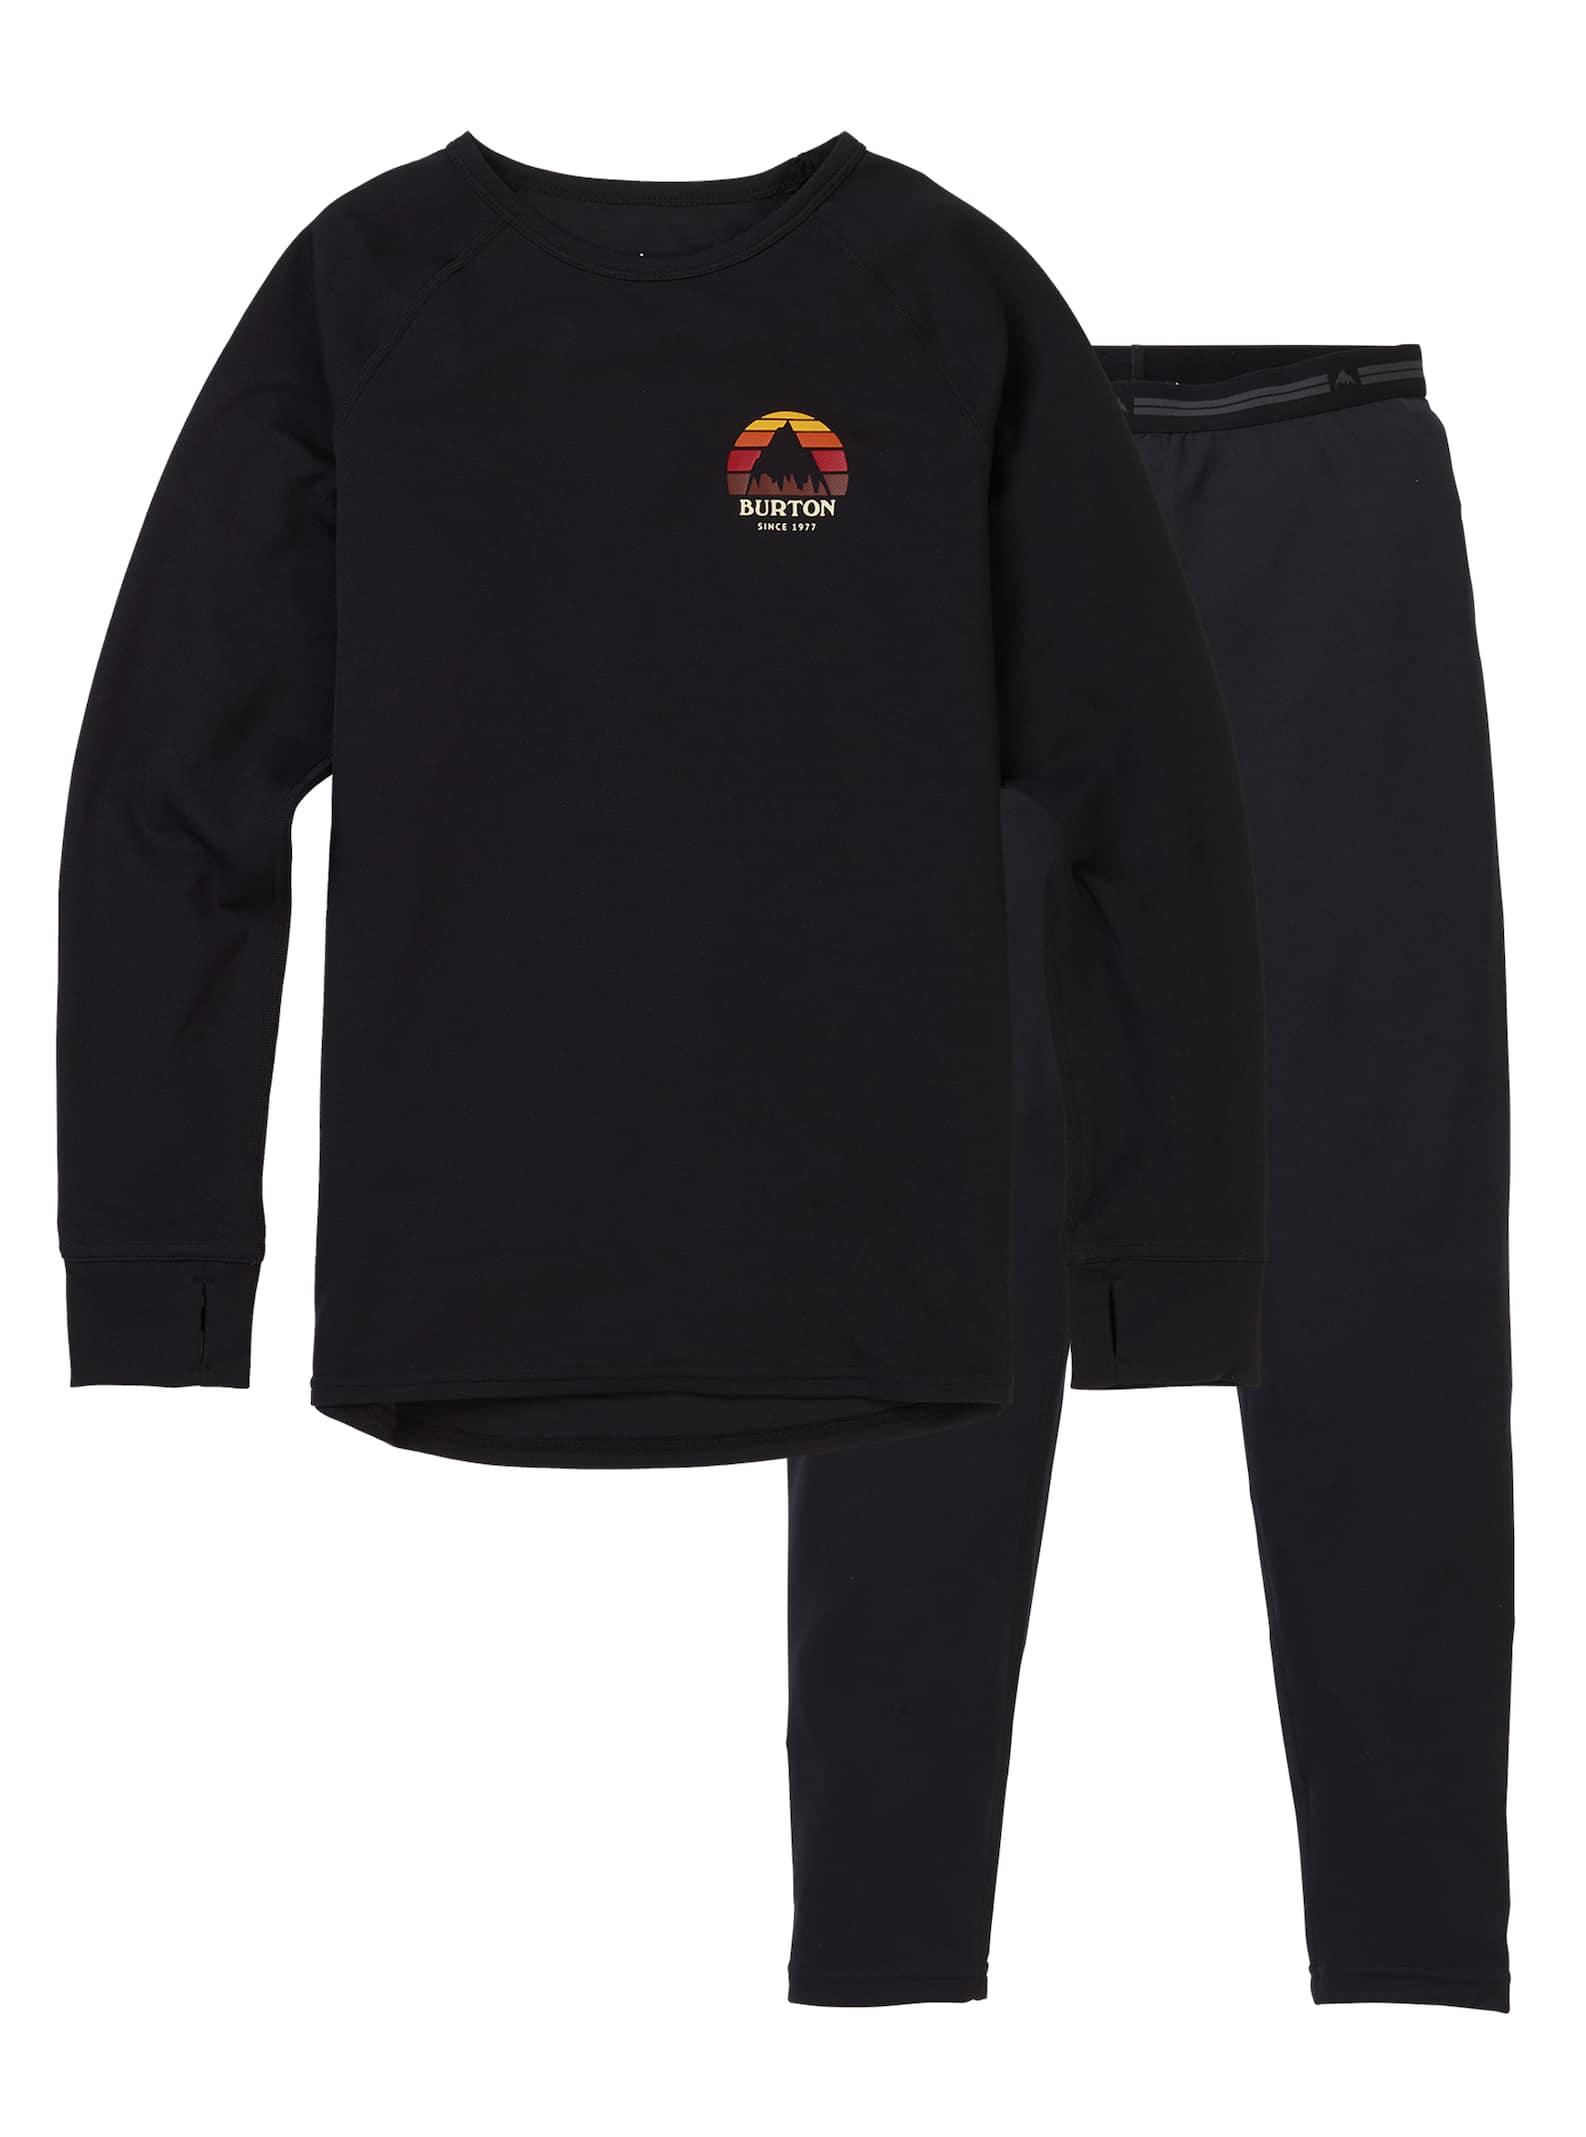 Burton Snowboards T shirt Youth Sz Large